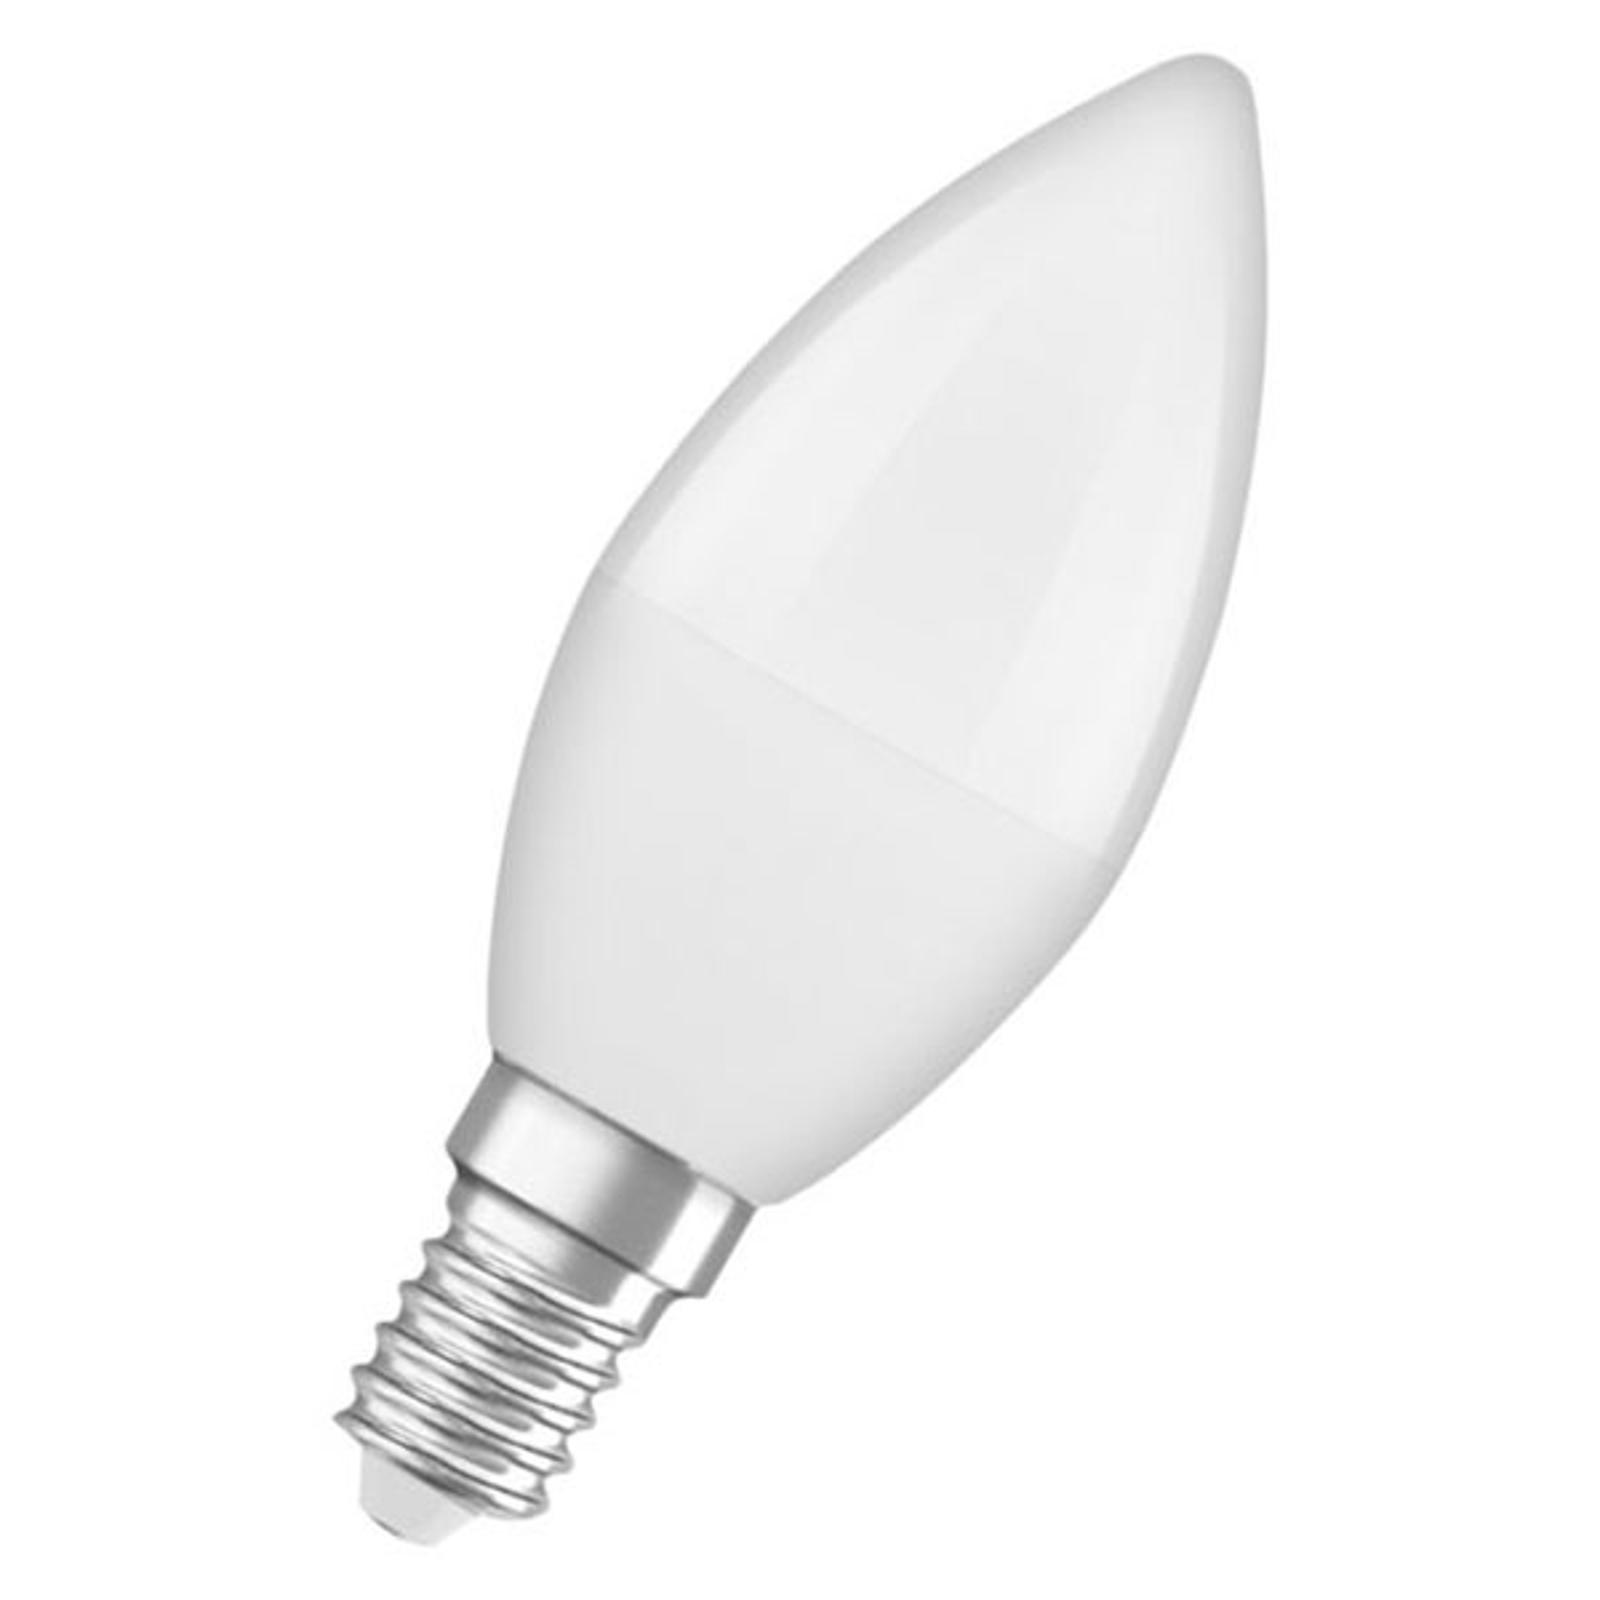 OSRAM Classic B LED-Lampe E14 3,3W 2.700K matt